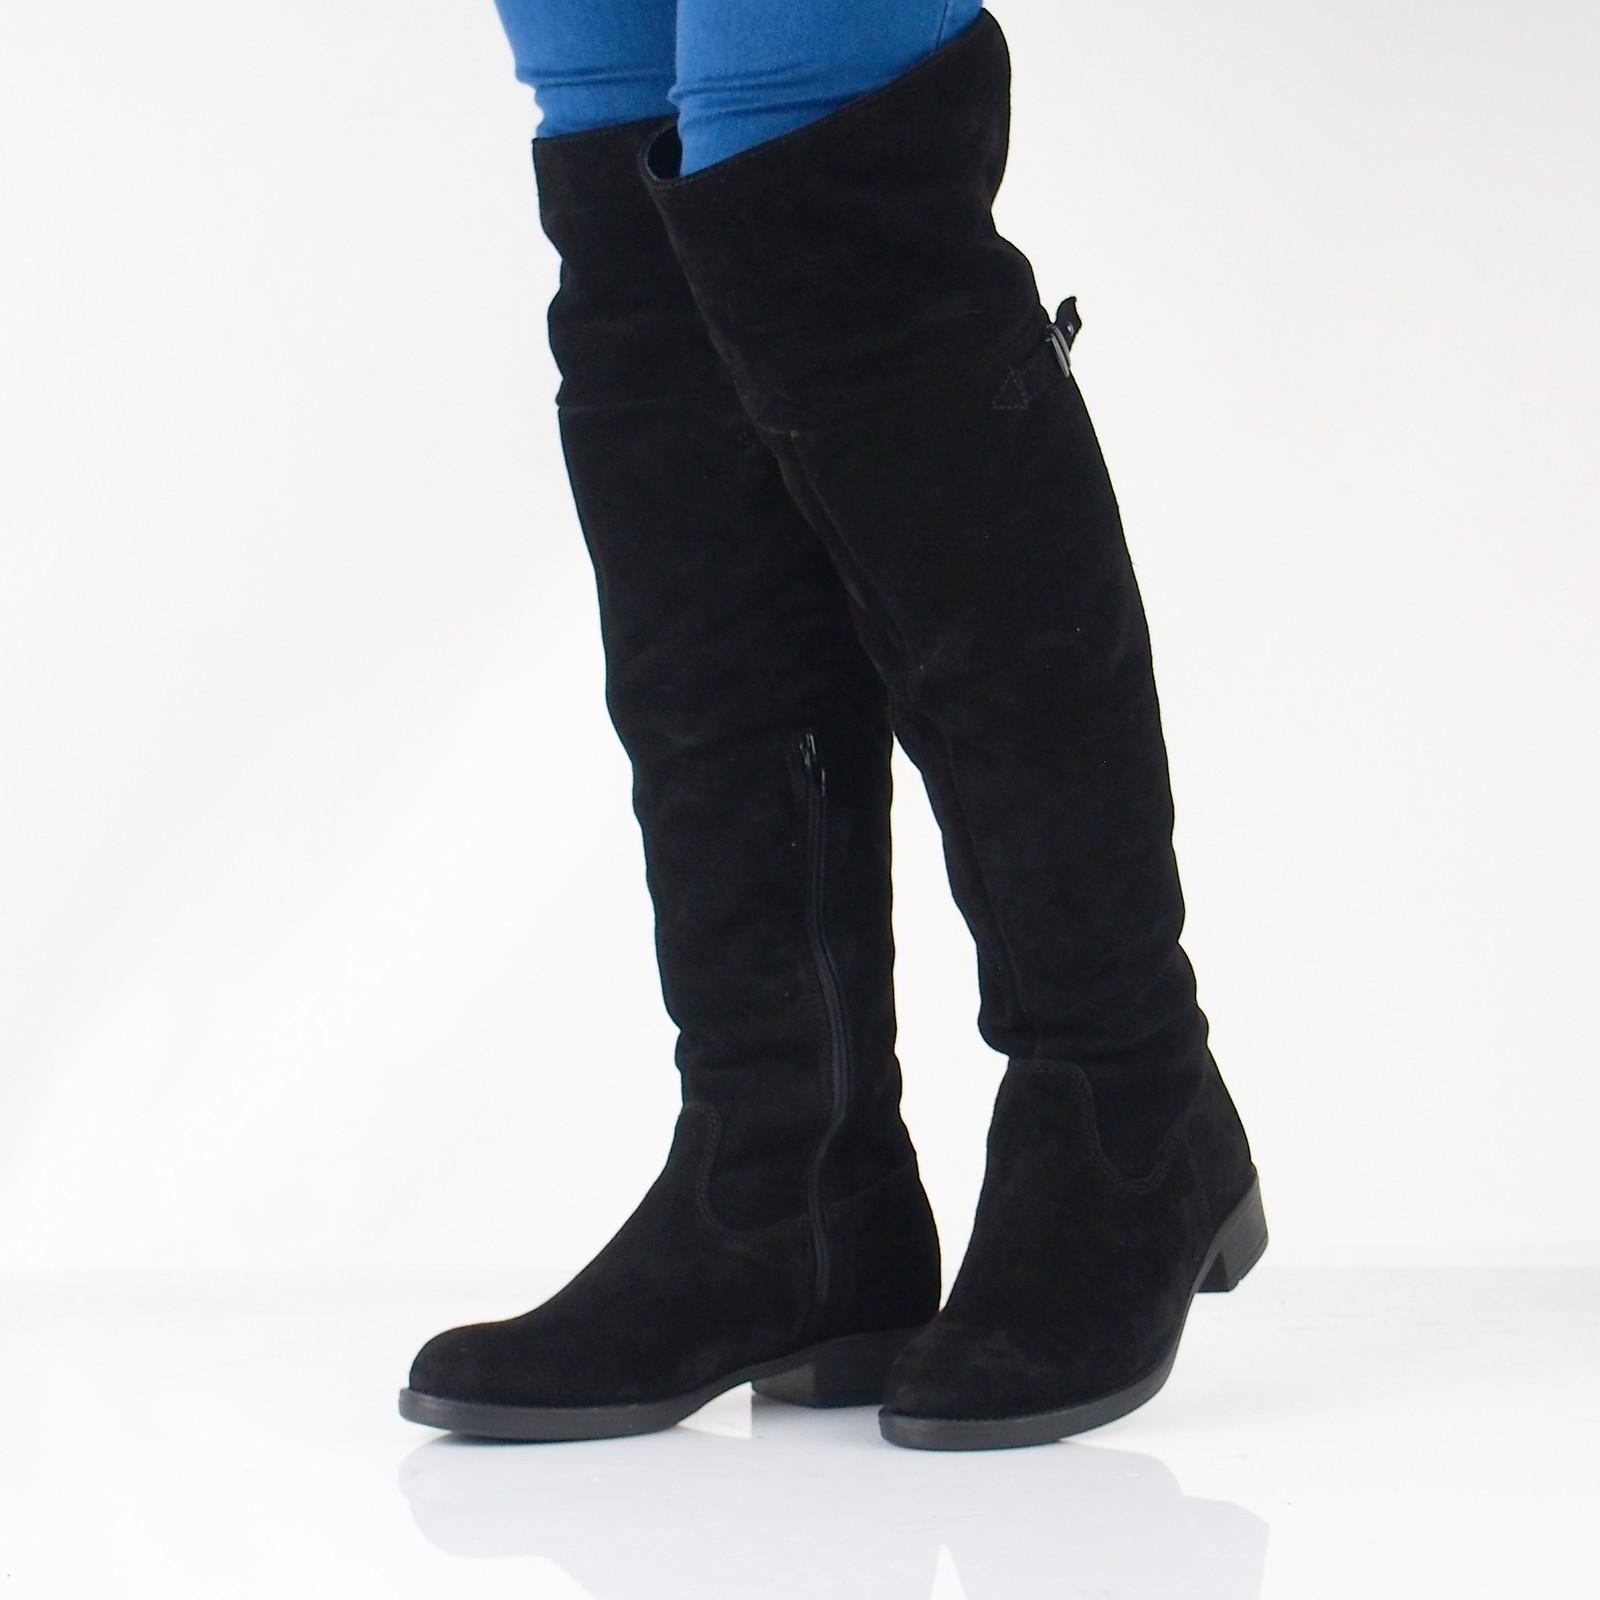 3e1eb00c033dc Tamaris dámske semišové vysoké čižmy - čierne | 2681121-BLK www.robel.sk